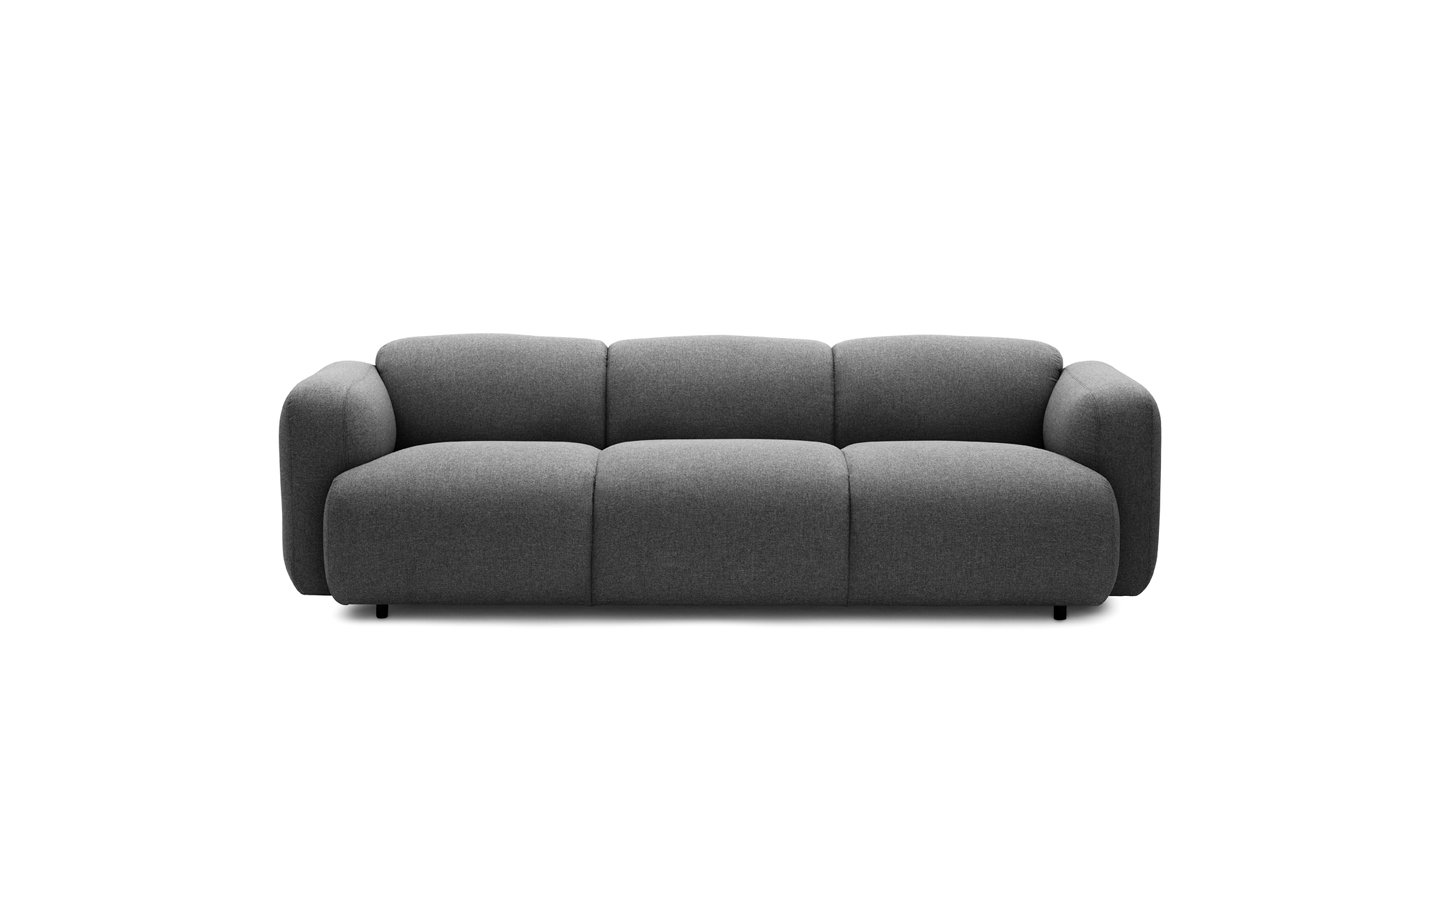 Swell sofa – three seater – grey